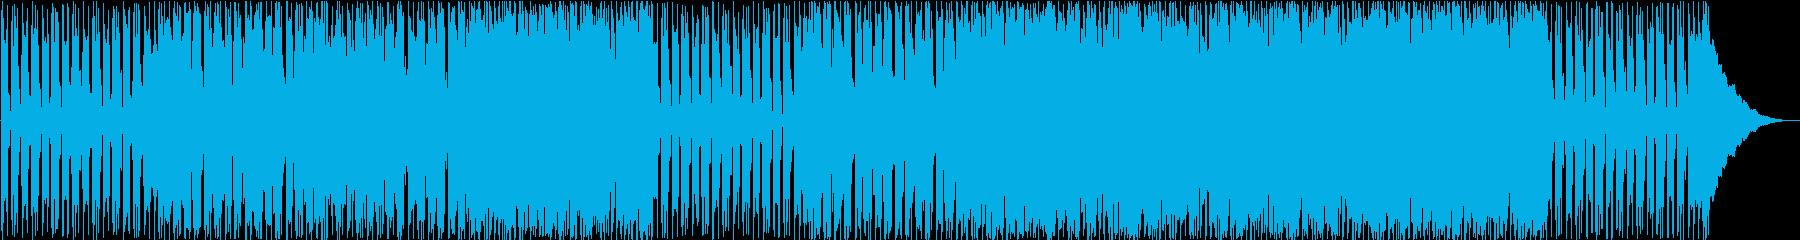 GREAT ESCAPEの再生済みの波形